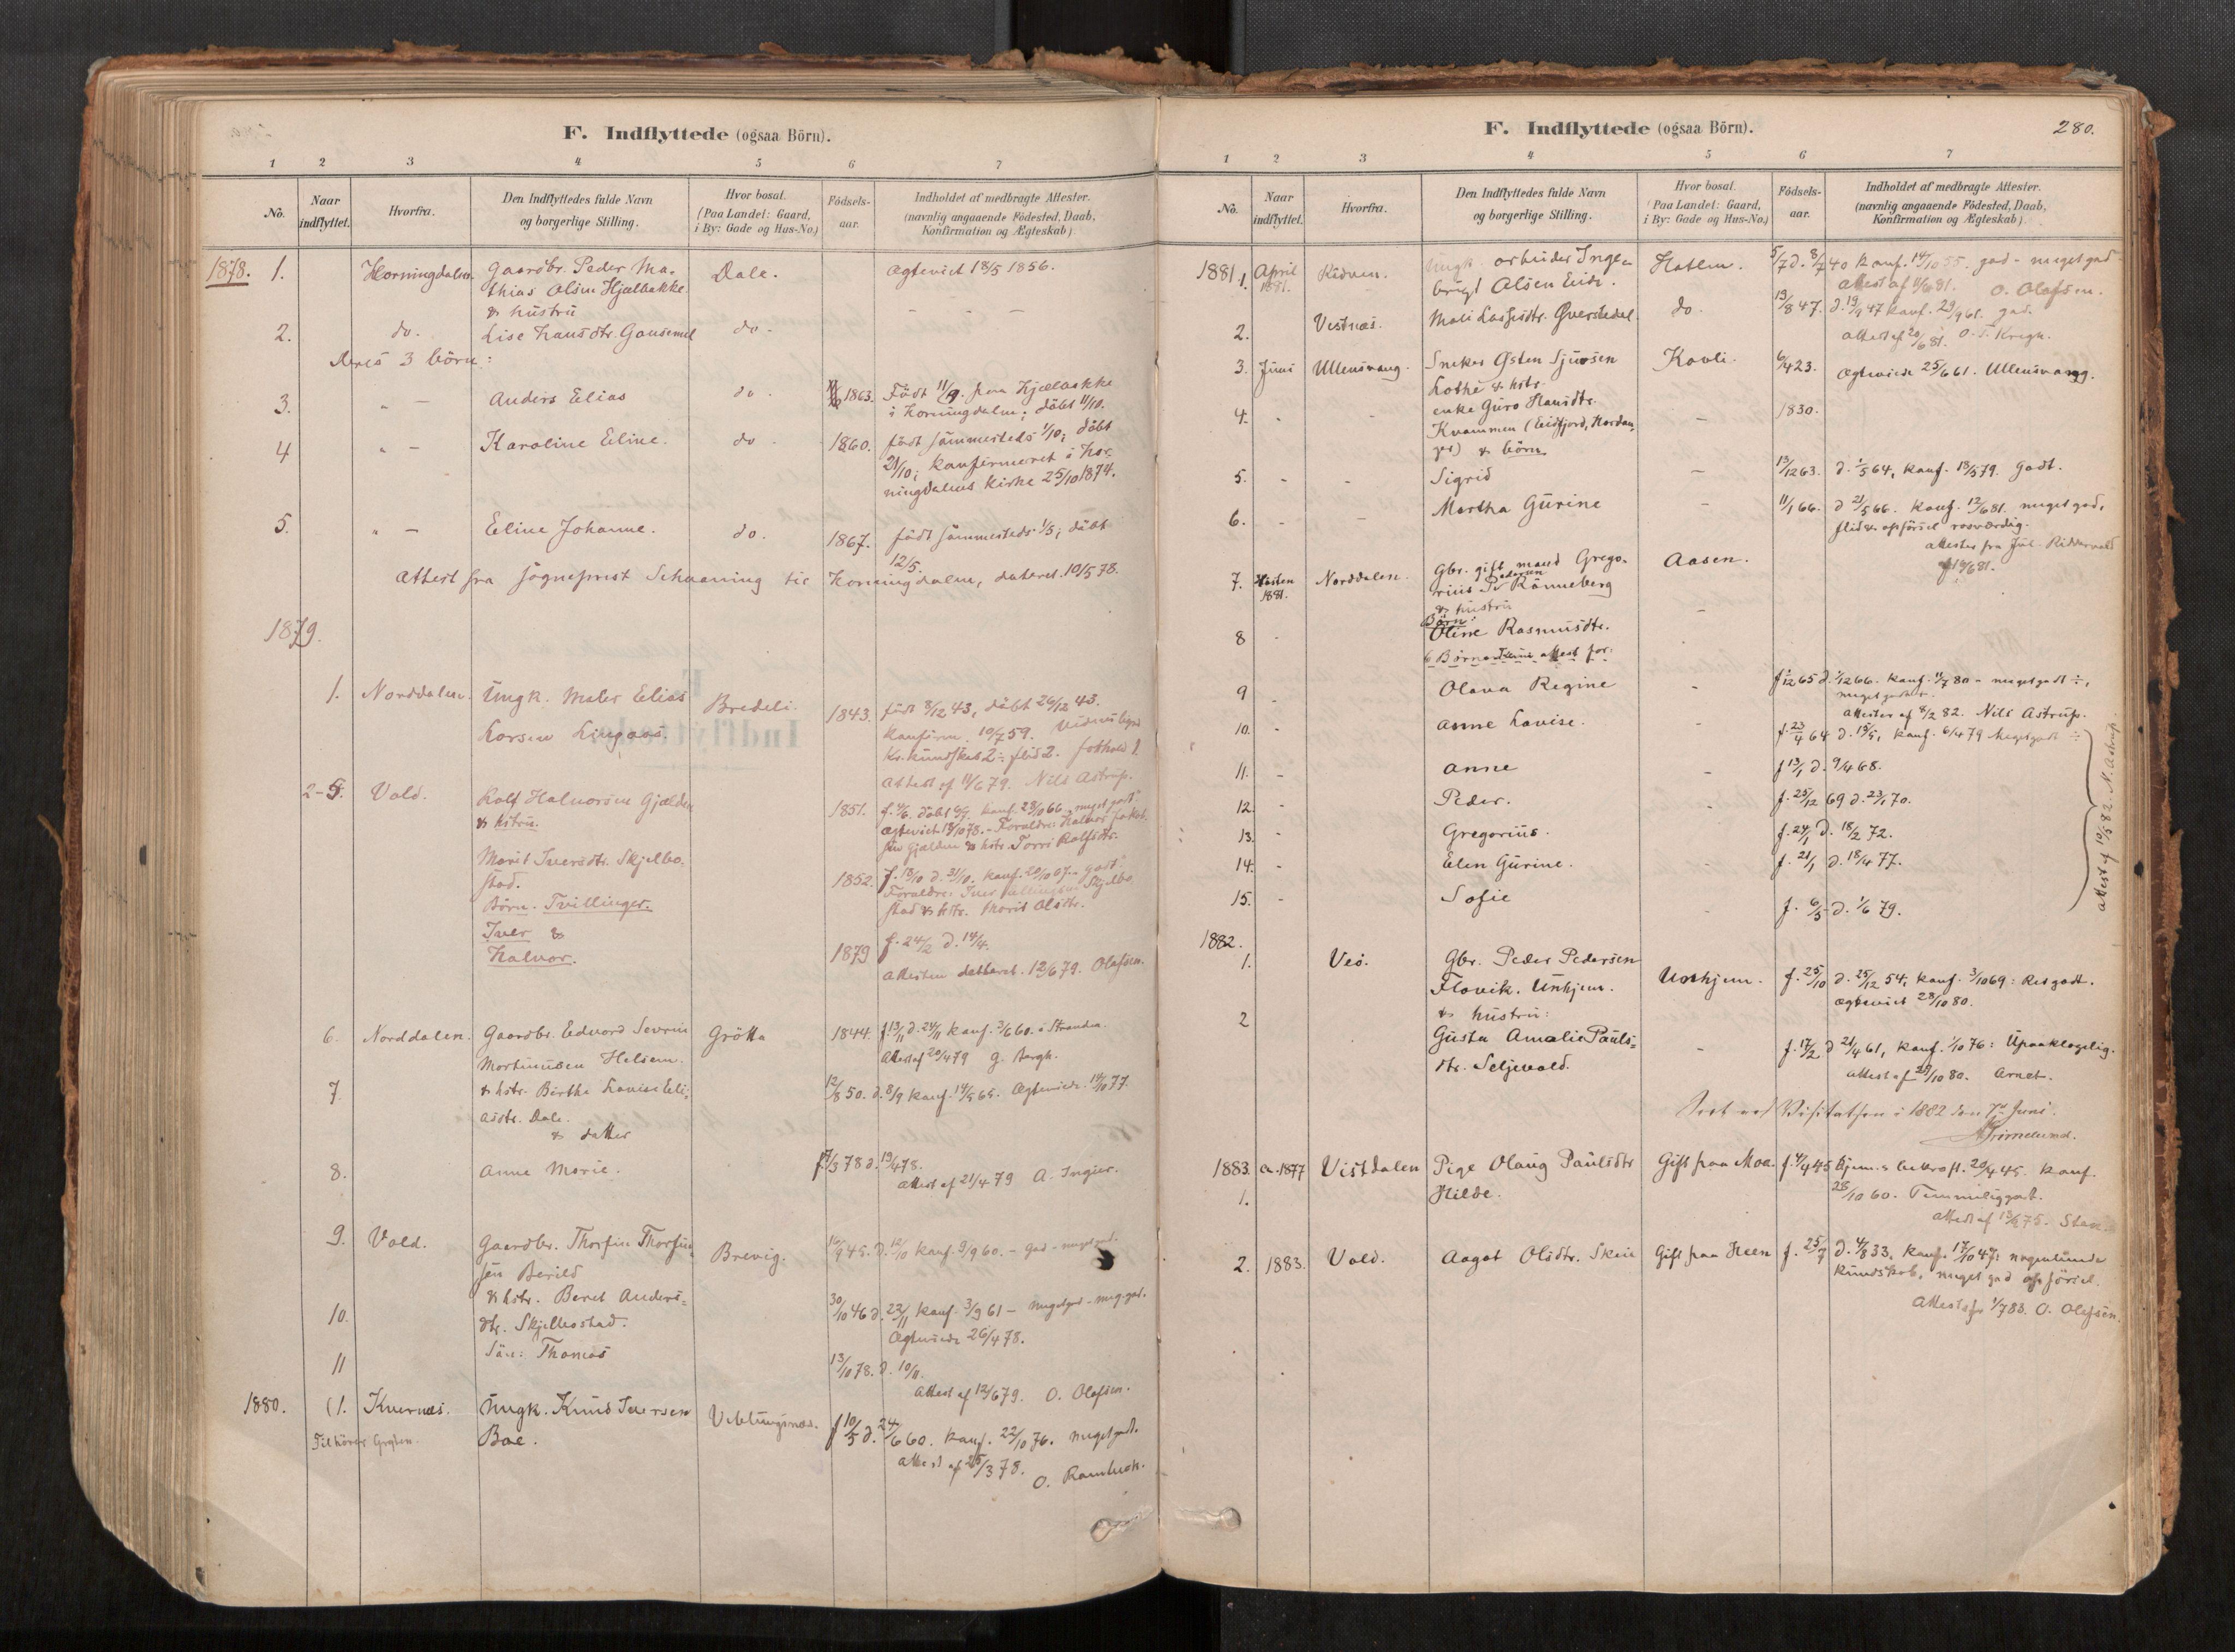 SAT, Grytten sokneprestkontor, Ministerialbok nr. 545A03, 1878-1920, s. 280